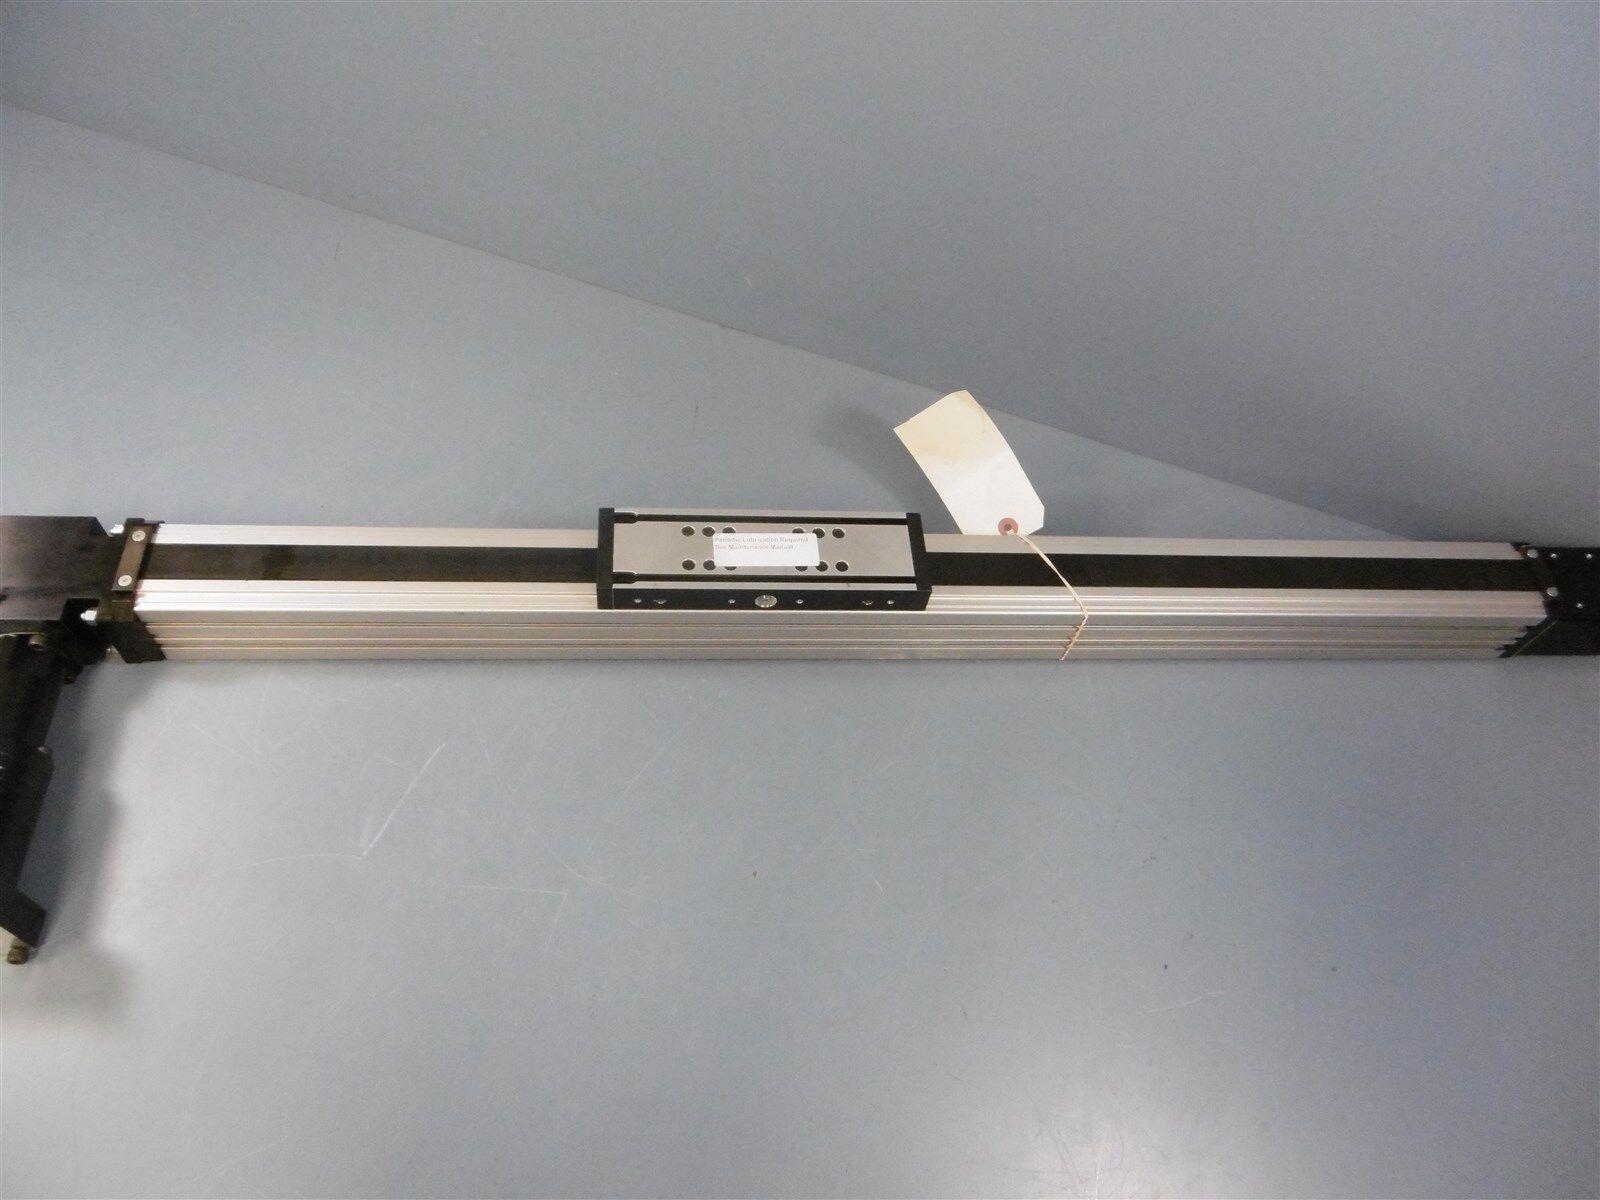 7234fea3cb23 Rexroth R114006000 Linear Slide Actuator Alpha LP 070-m01-5 Servo ...